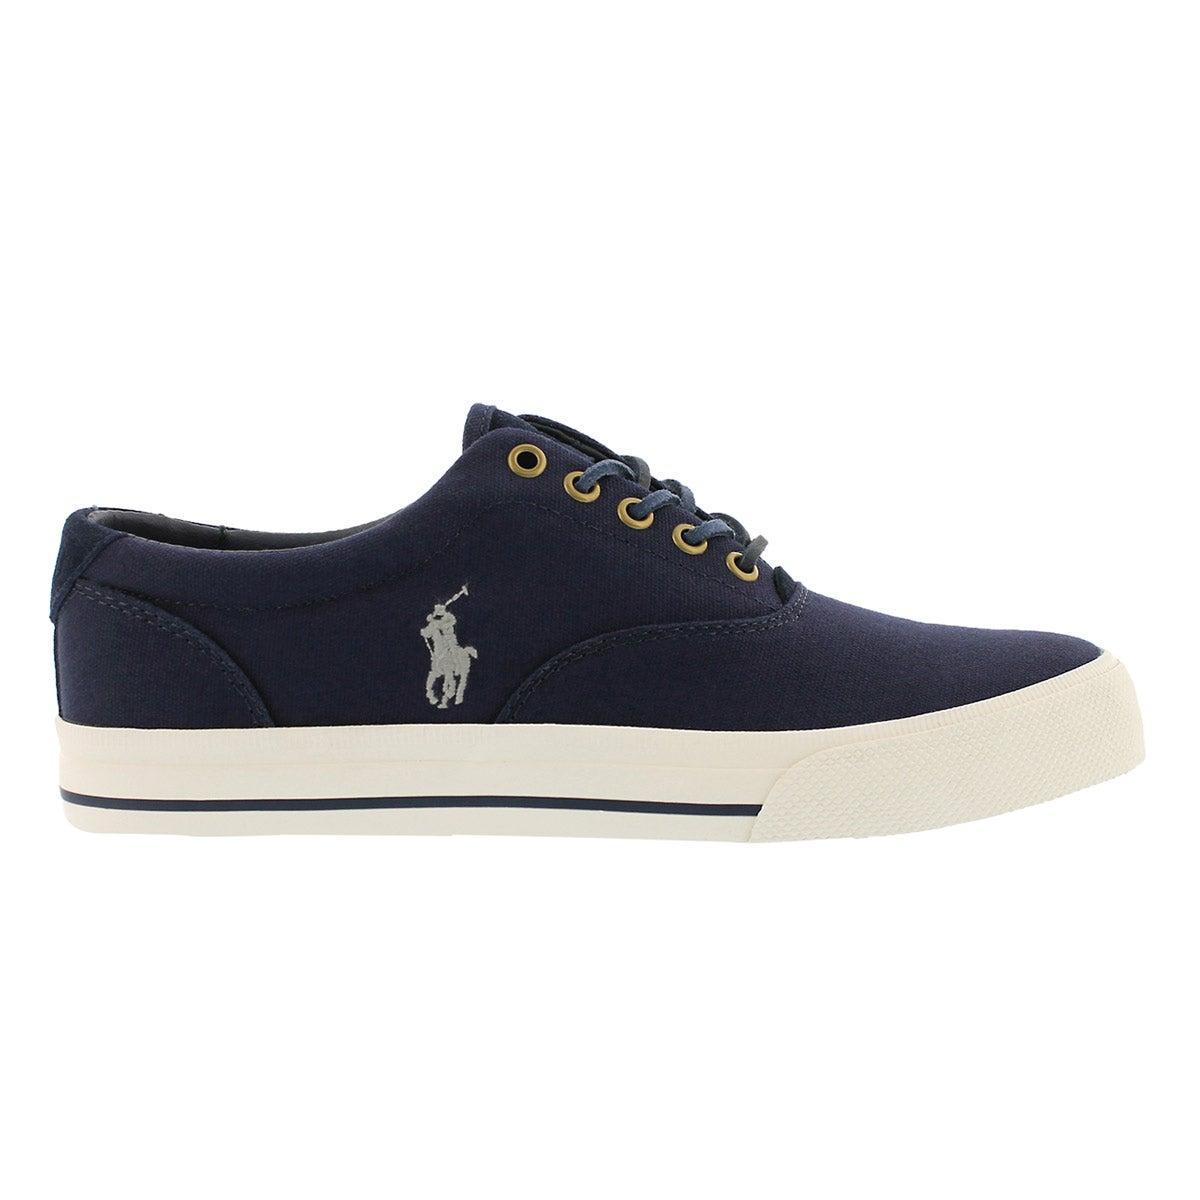 Mns Vaughn newport navy canvas sneaker